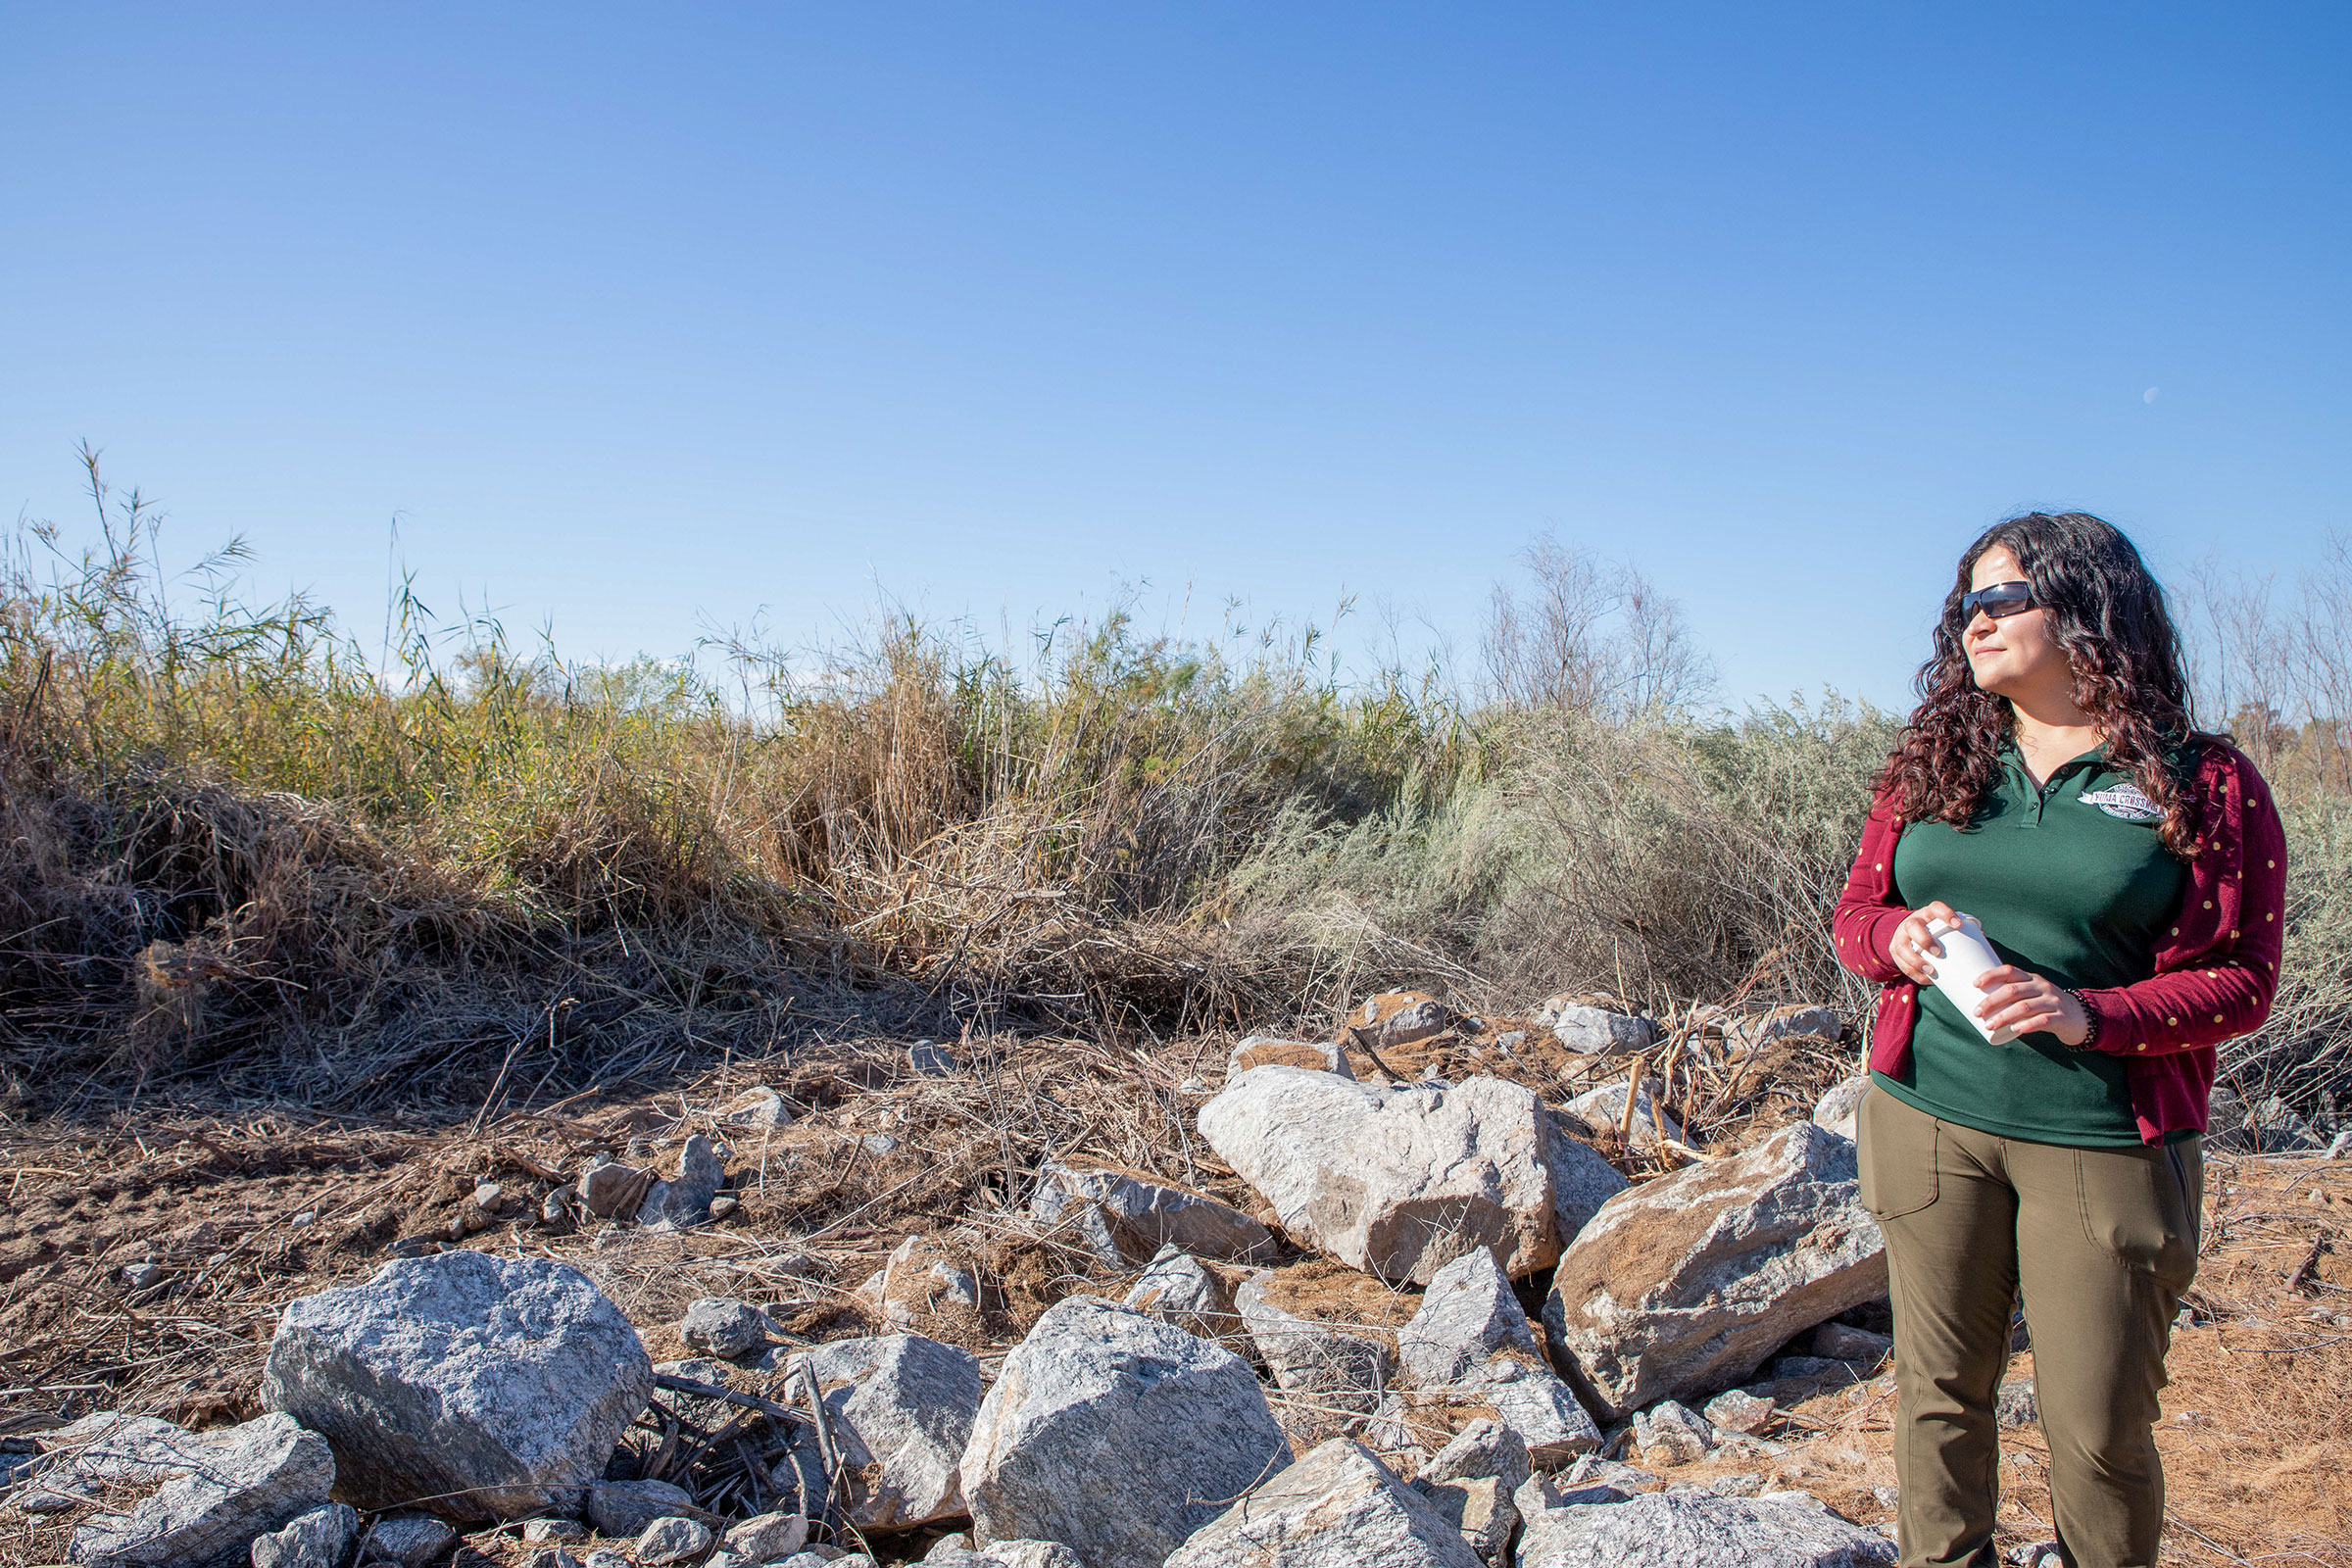 Vianey Avila of the Yuma Crossing National Heritage Area surveys the 17-acre invasive-plant grant project. Yuma, Arizona. Dominic Arenas/Audubon